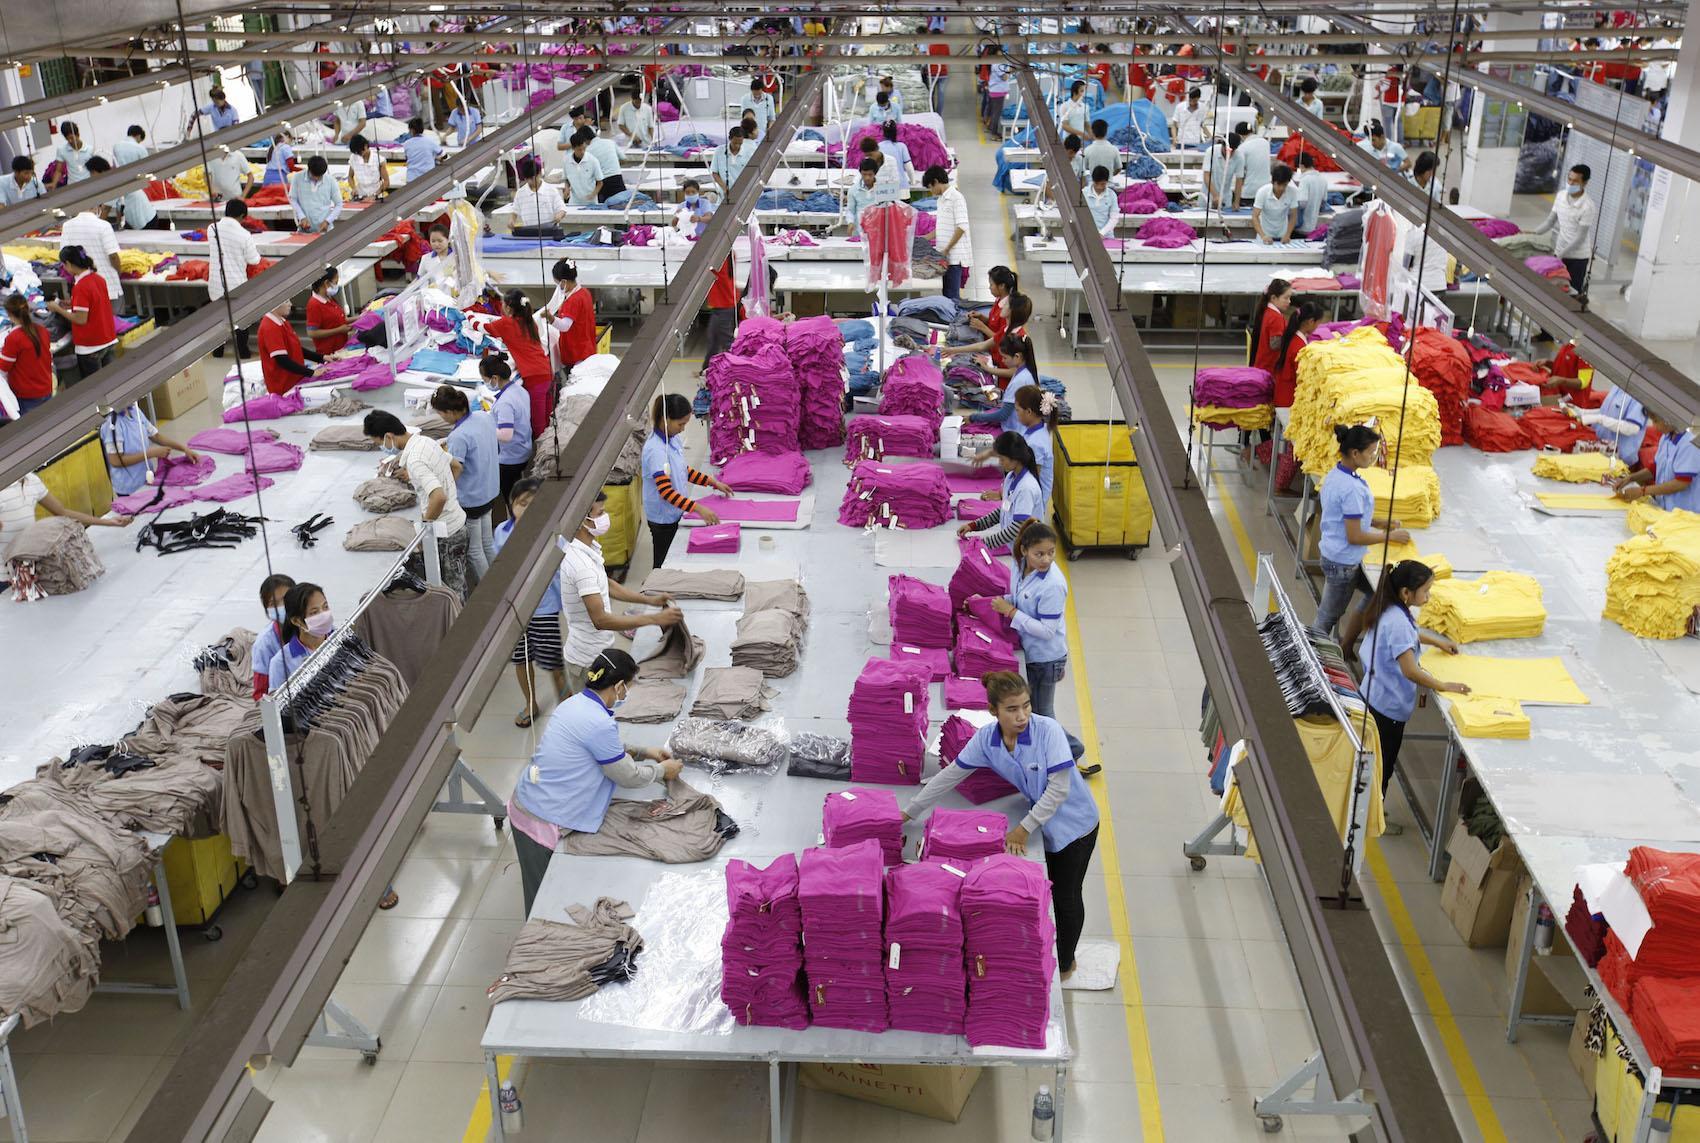 Cambodia Economy Garment Factory - Jun 2013